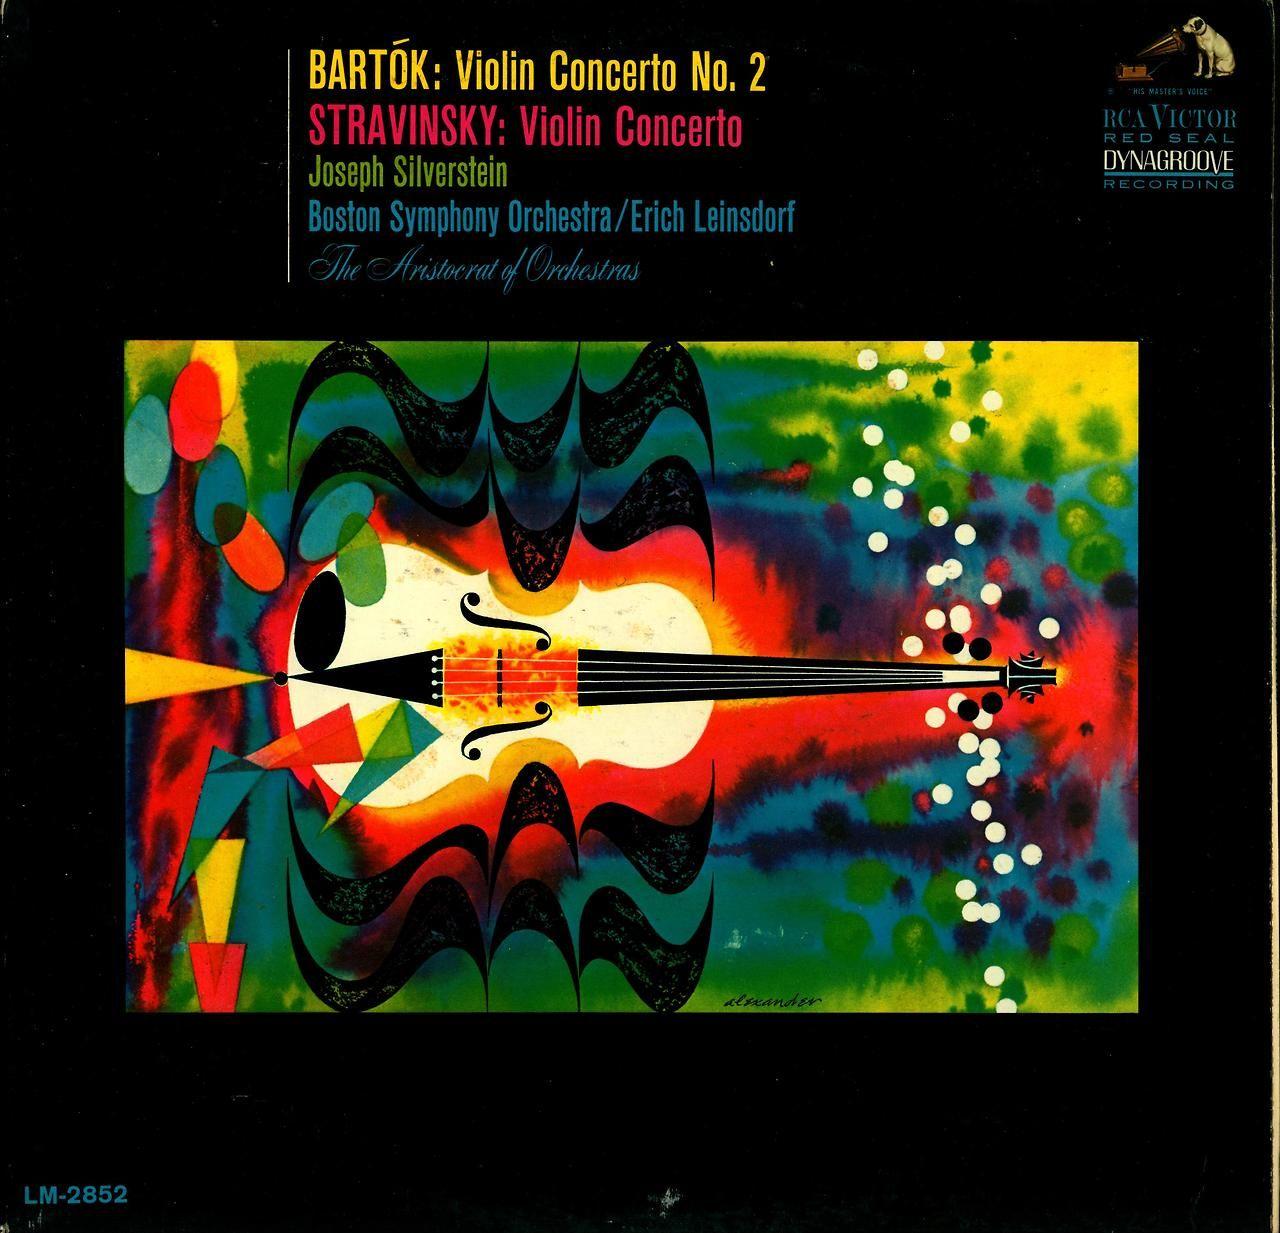 "Bartok- Violin Concerto No. 2 Stravinsky- Violin Concerto  Joseph Silverstein, violin.  Boston Symphony Orchestra Eric Leinsdorf, cond.   RCA Victor Red Seal LM-2852 (1965)  Cover Art by ""alexander"""